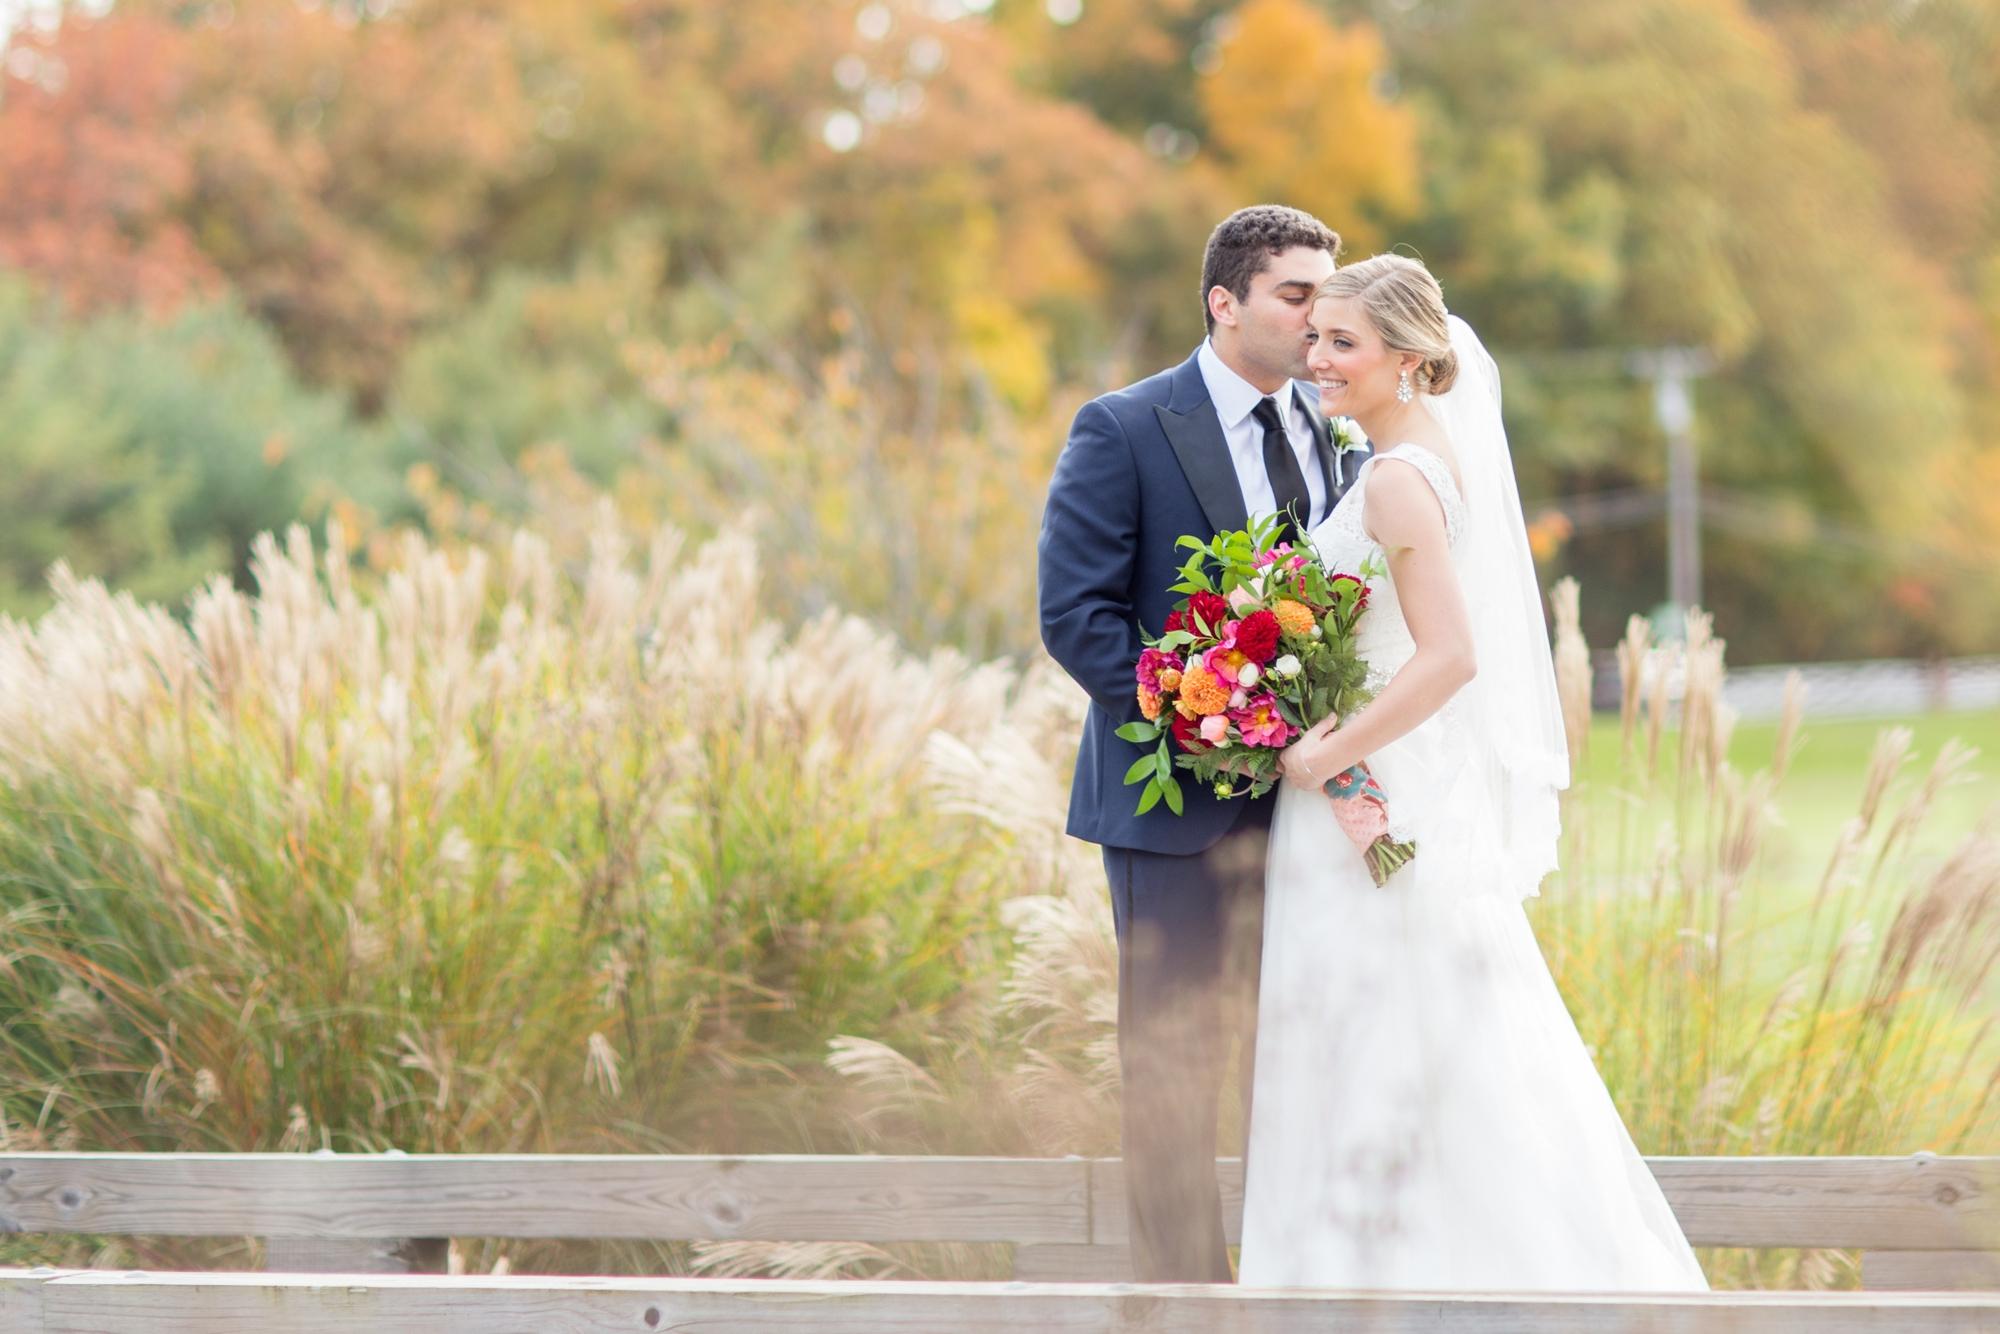 2-Finkel Wedding Bride & Groom Portraits-345_anna grace photography maryland wedding photographer turf valley.jpg